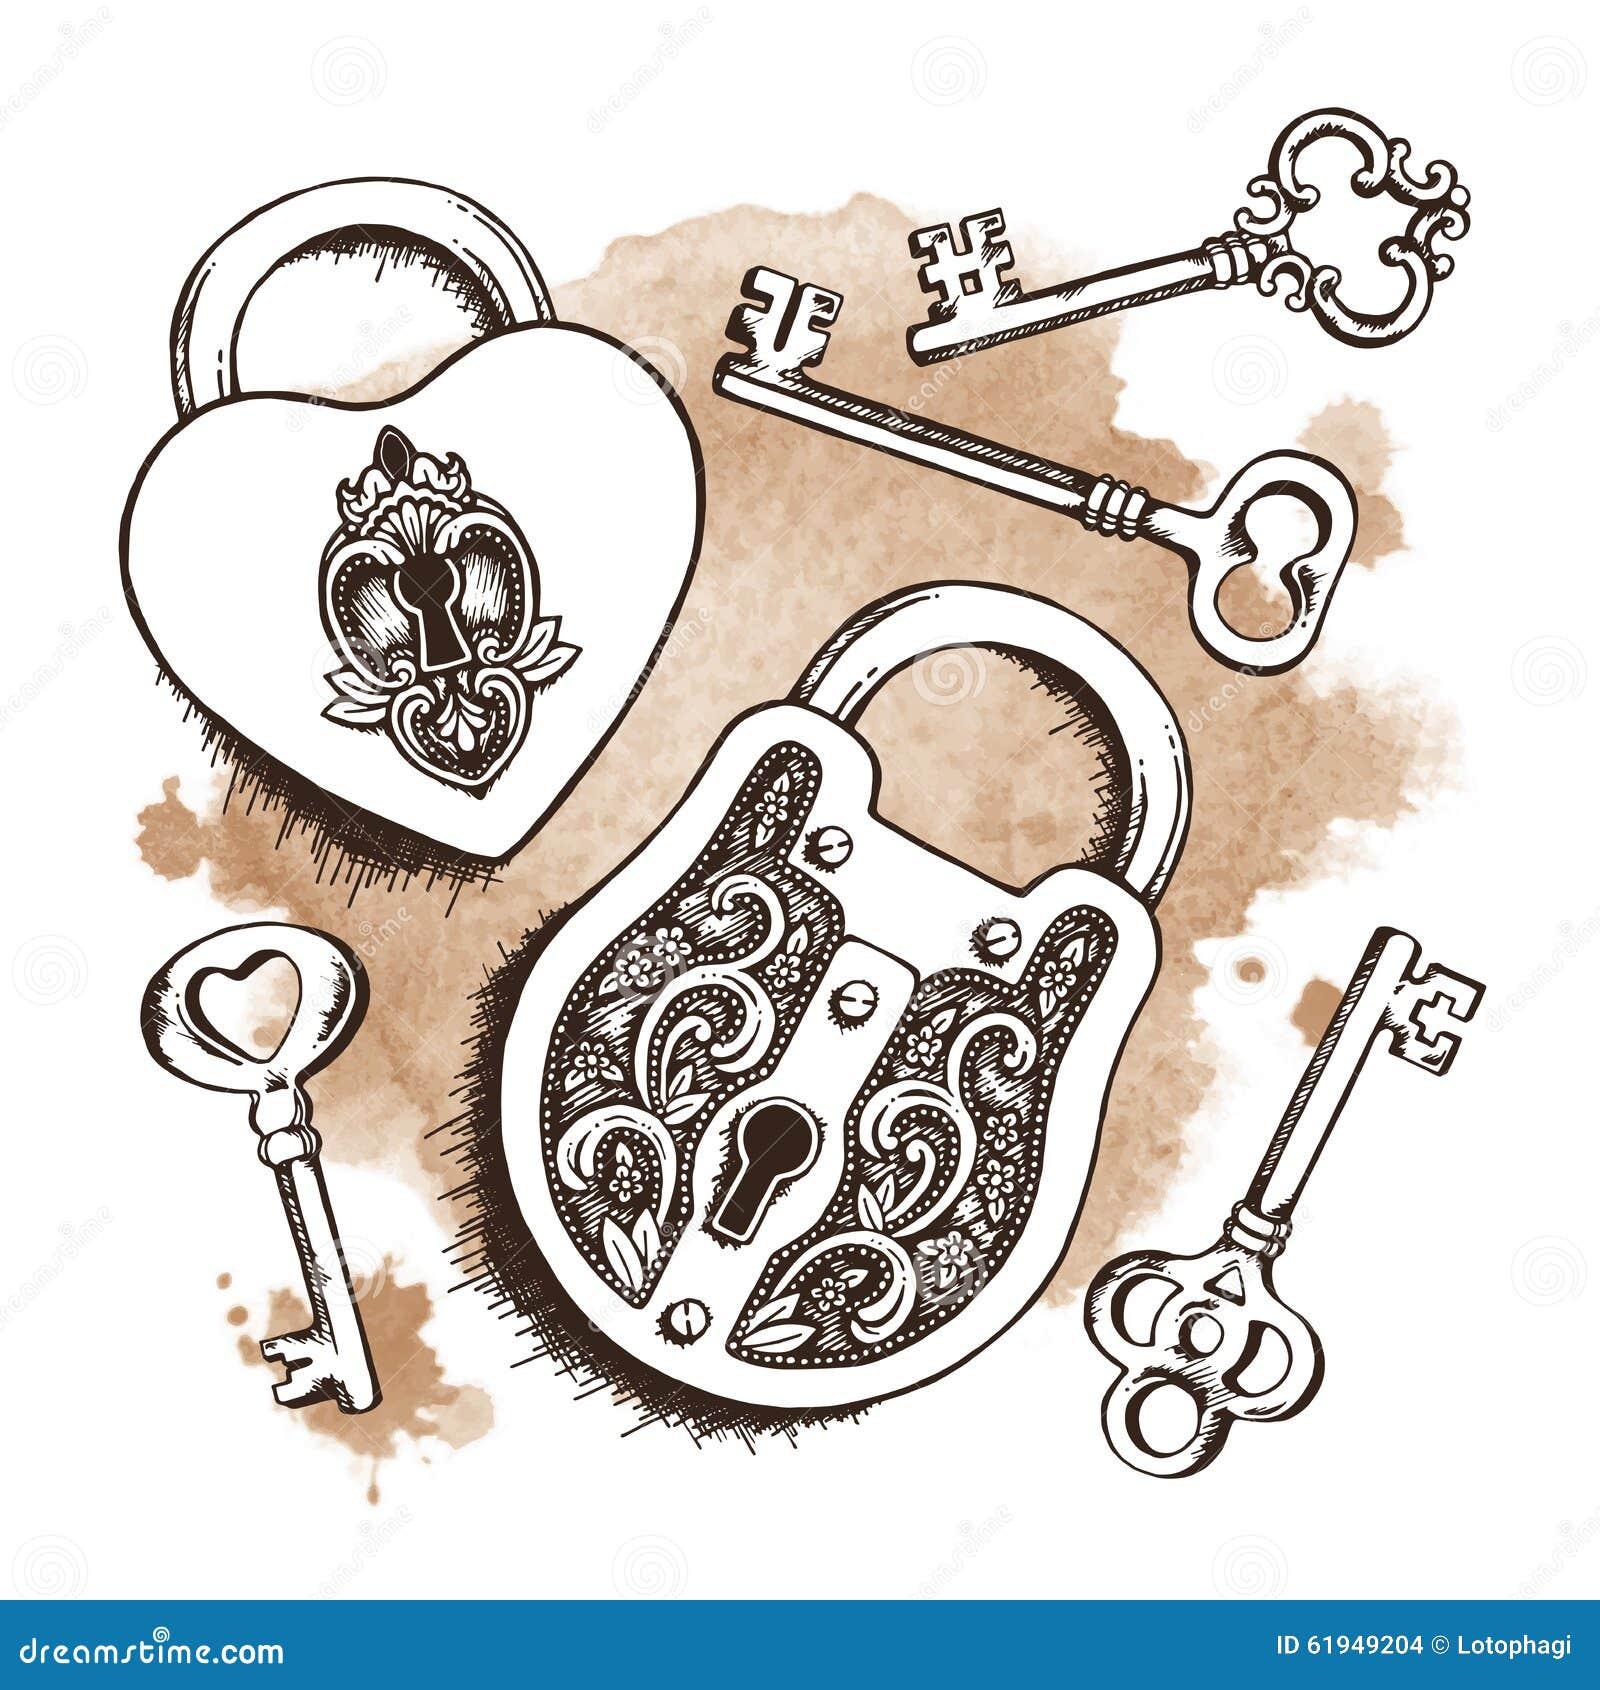 Vector Key Illustration: Keys And Locks Over Watercolor Background. Vector